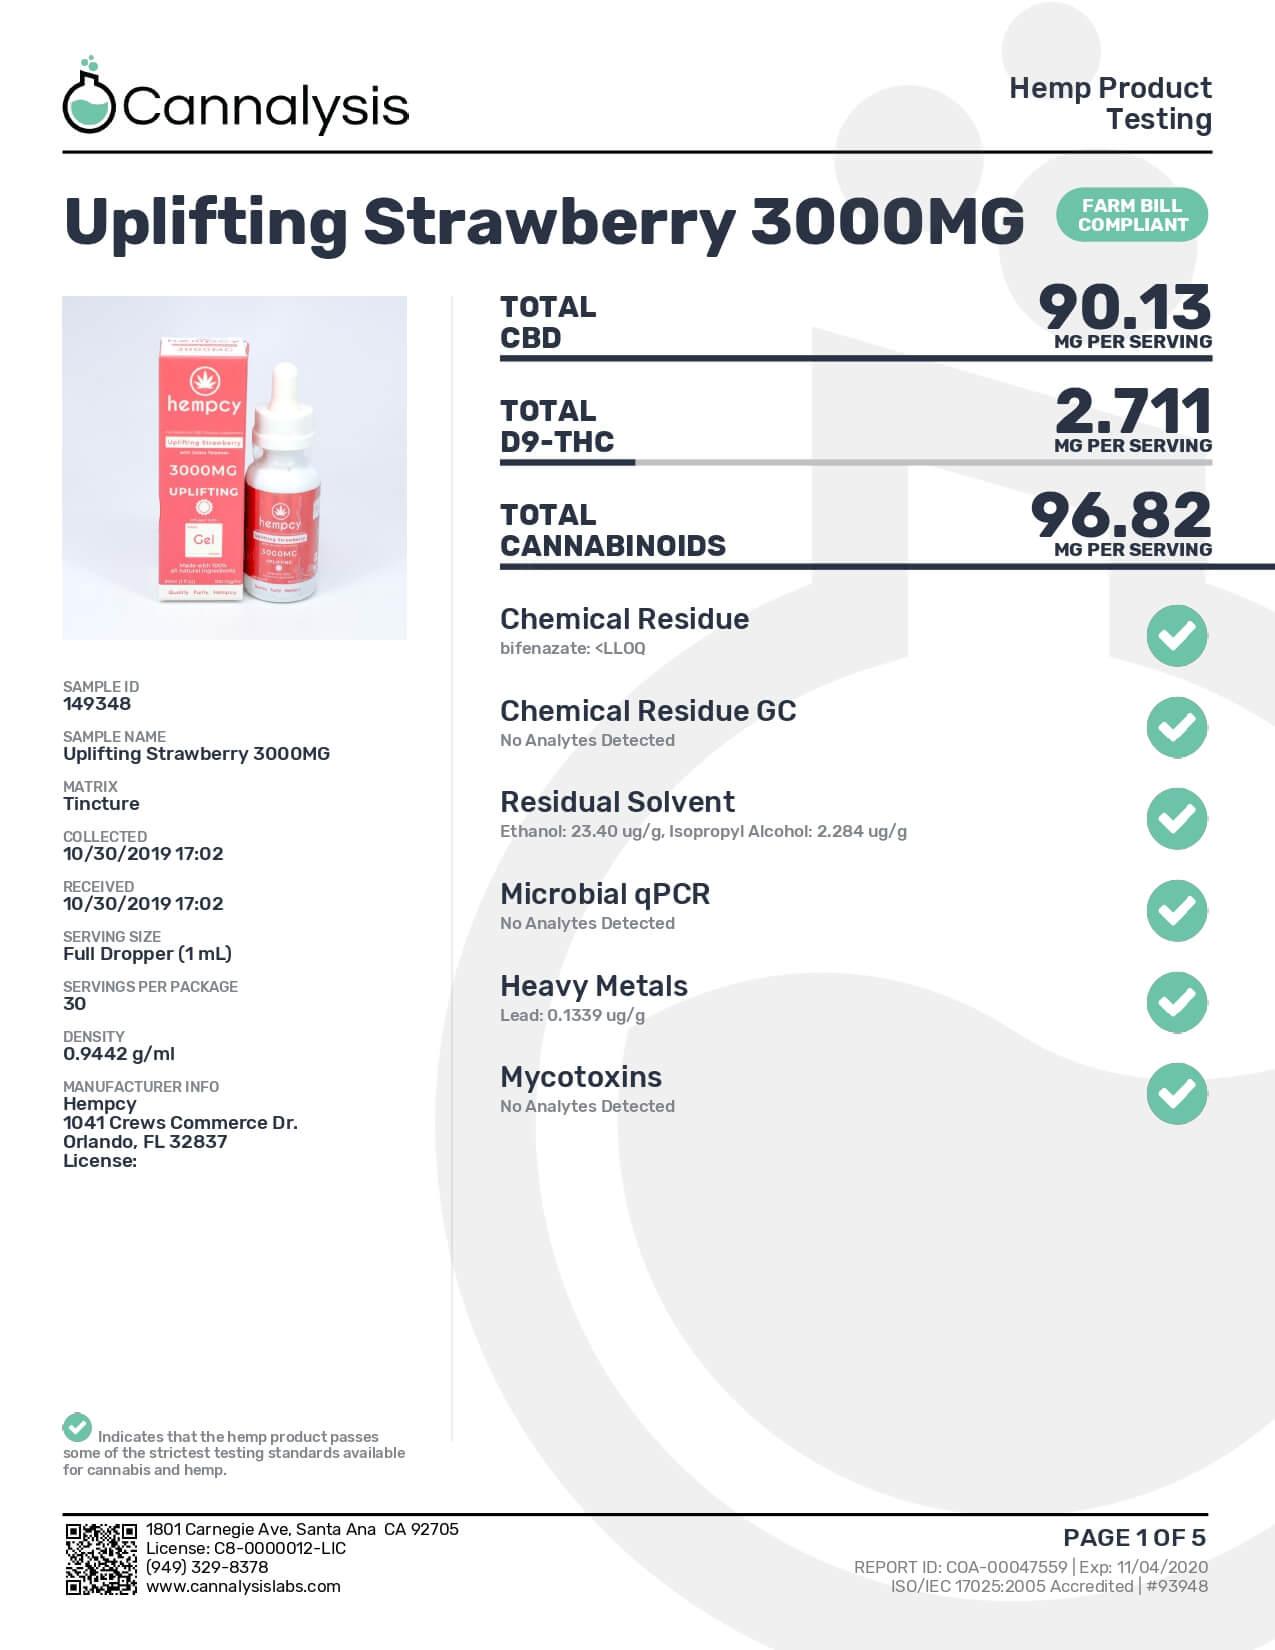 Hempcy CBD Tincture Uplifting Strawberry 3000mg Lab Report